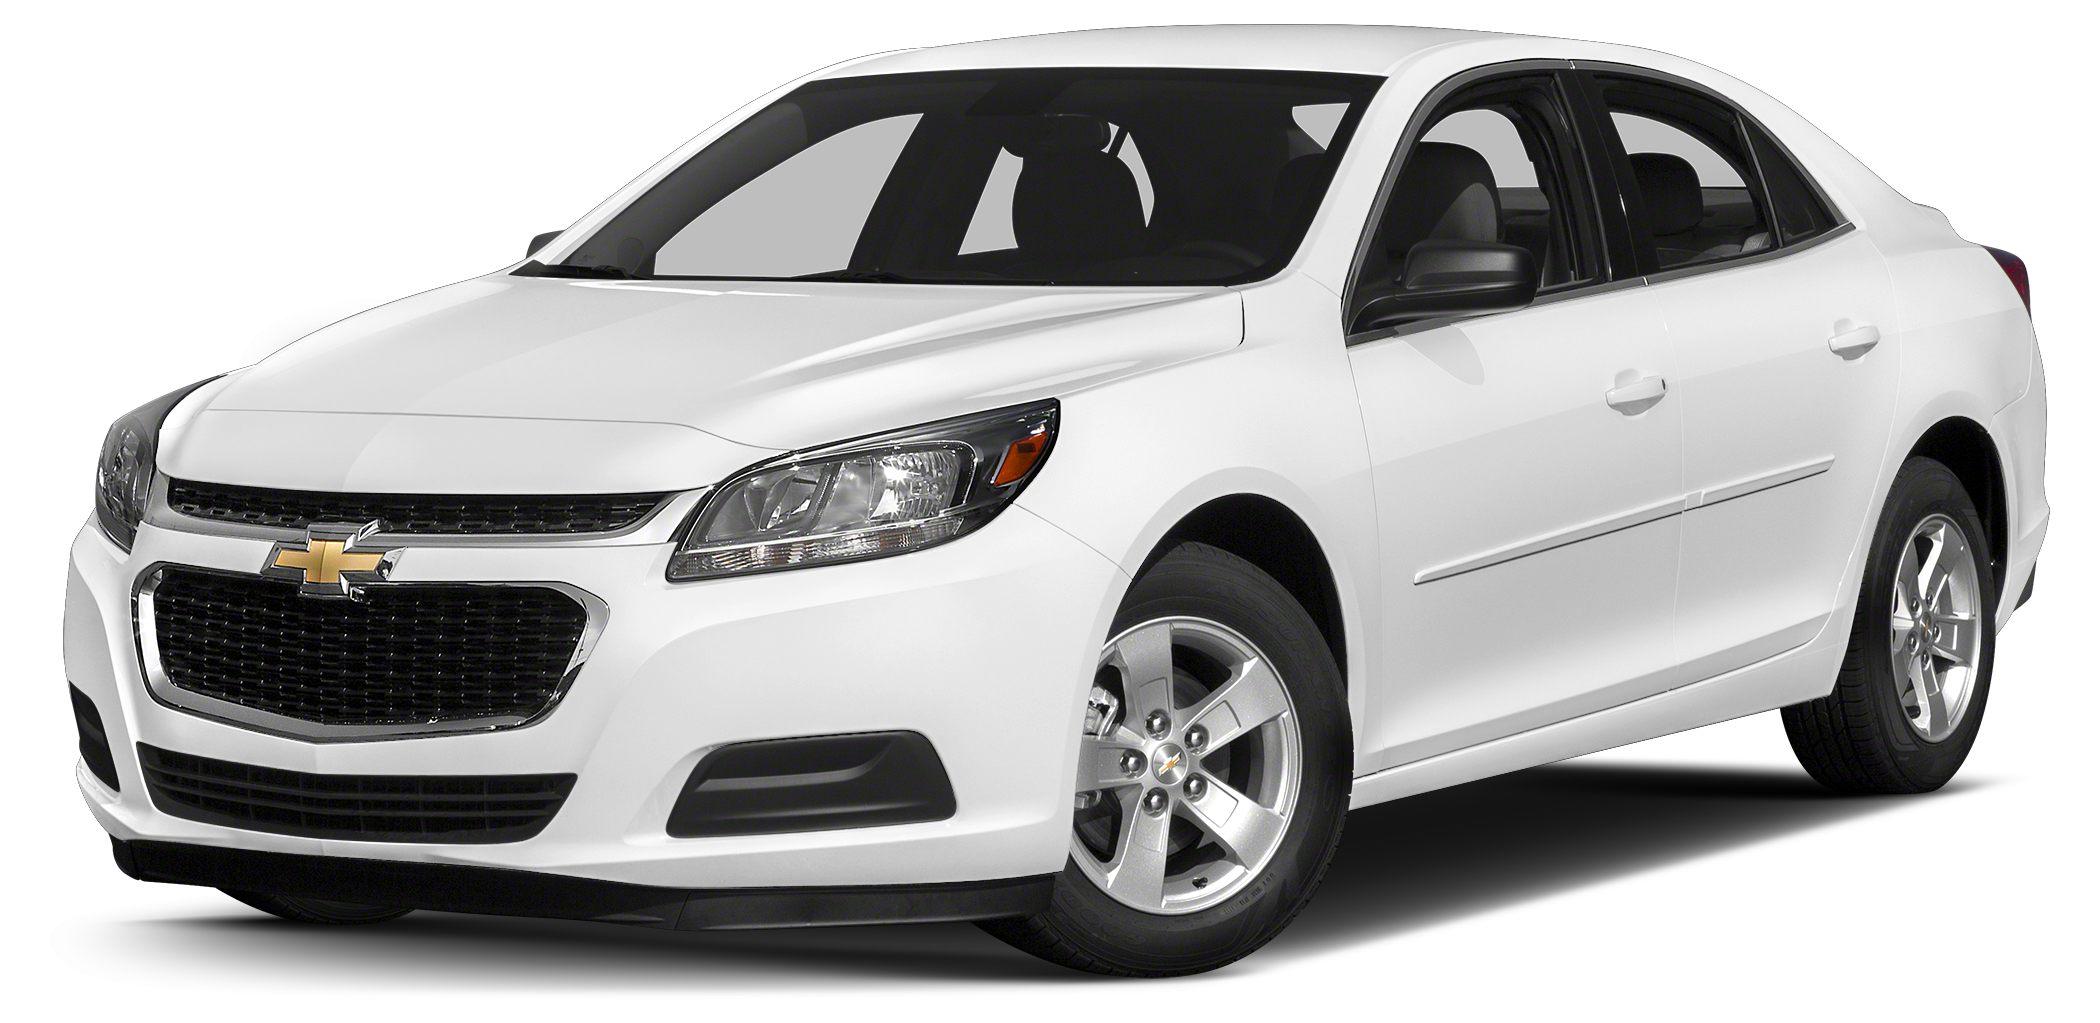 2014 Chevrolet Malibu LT w2LT Clean Carfax - 1 Owner - GM Certified - Power Sunroof - Chevrolet M